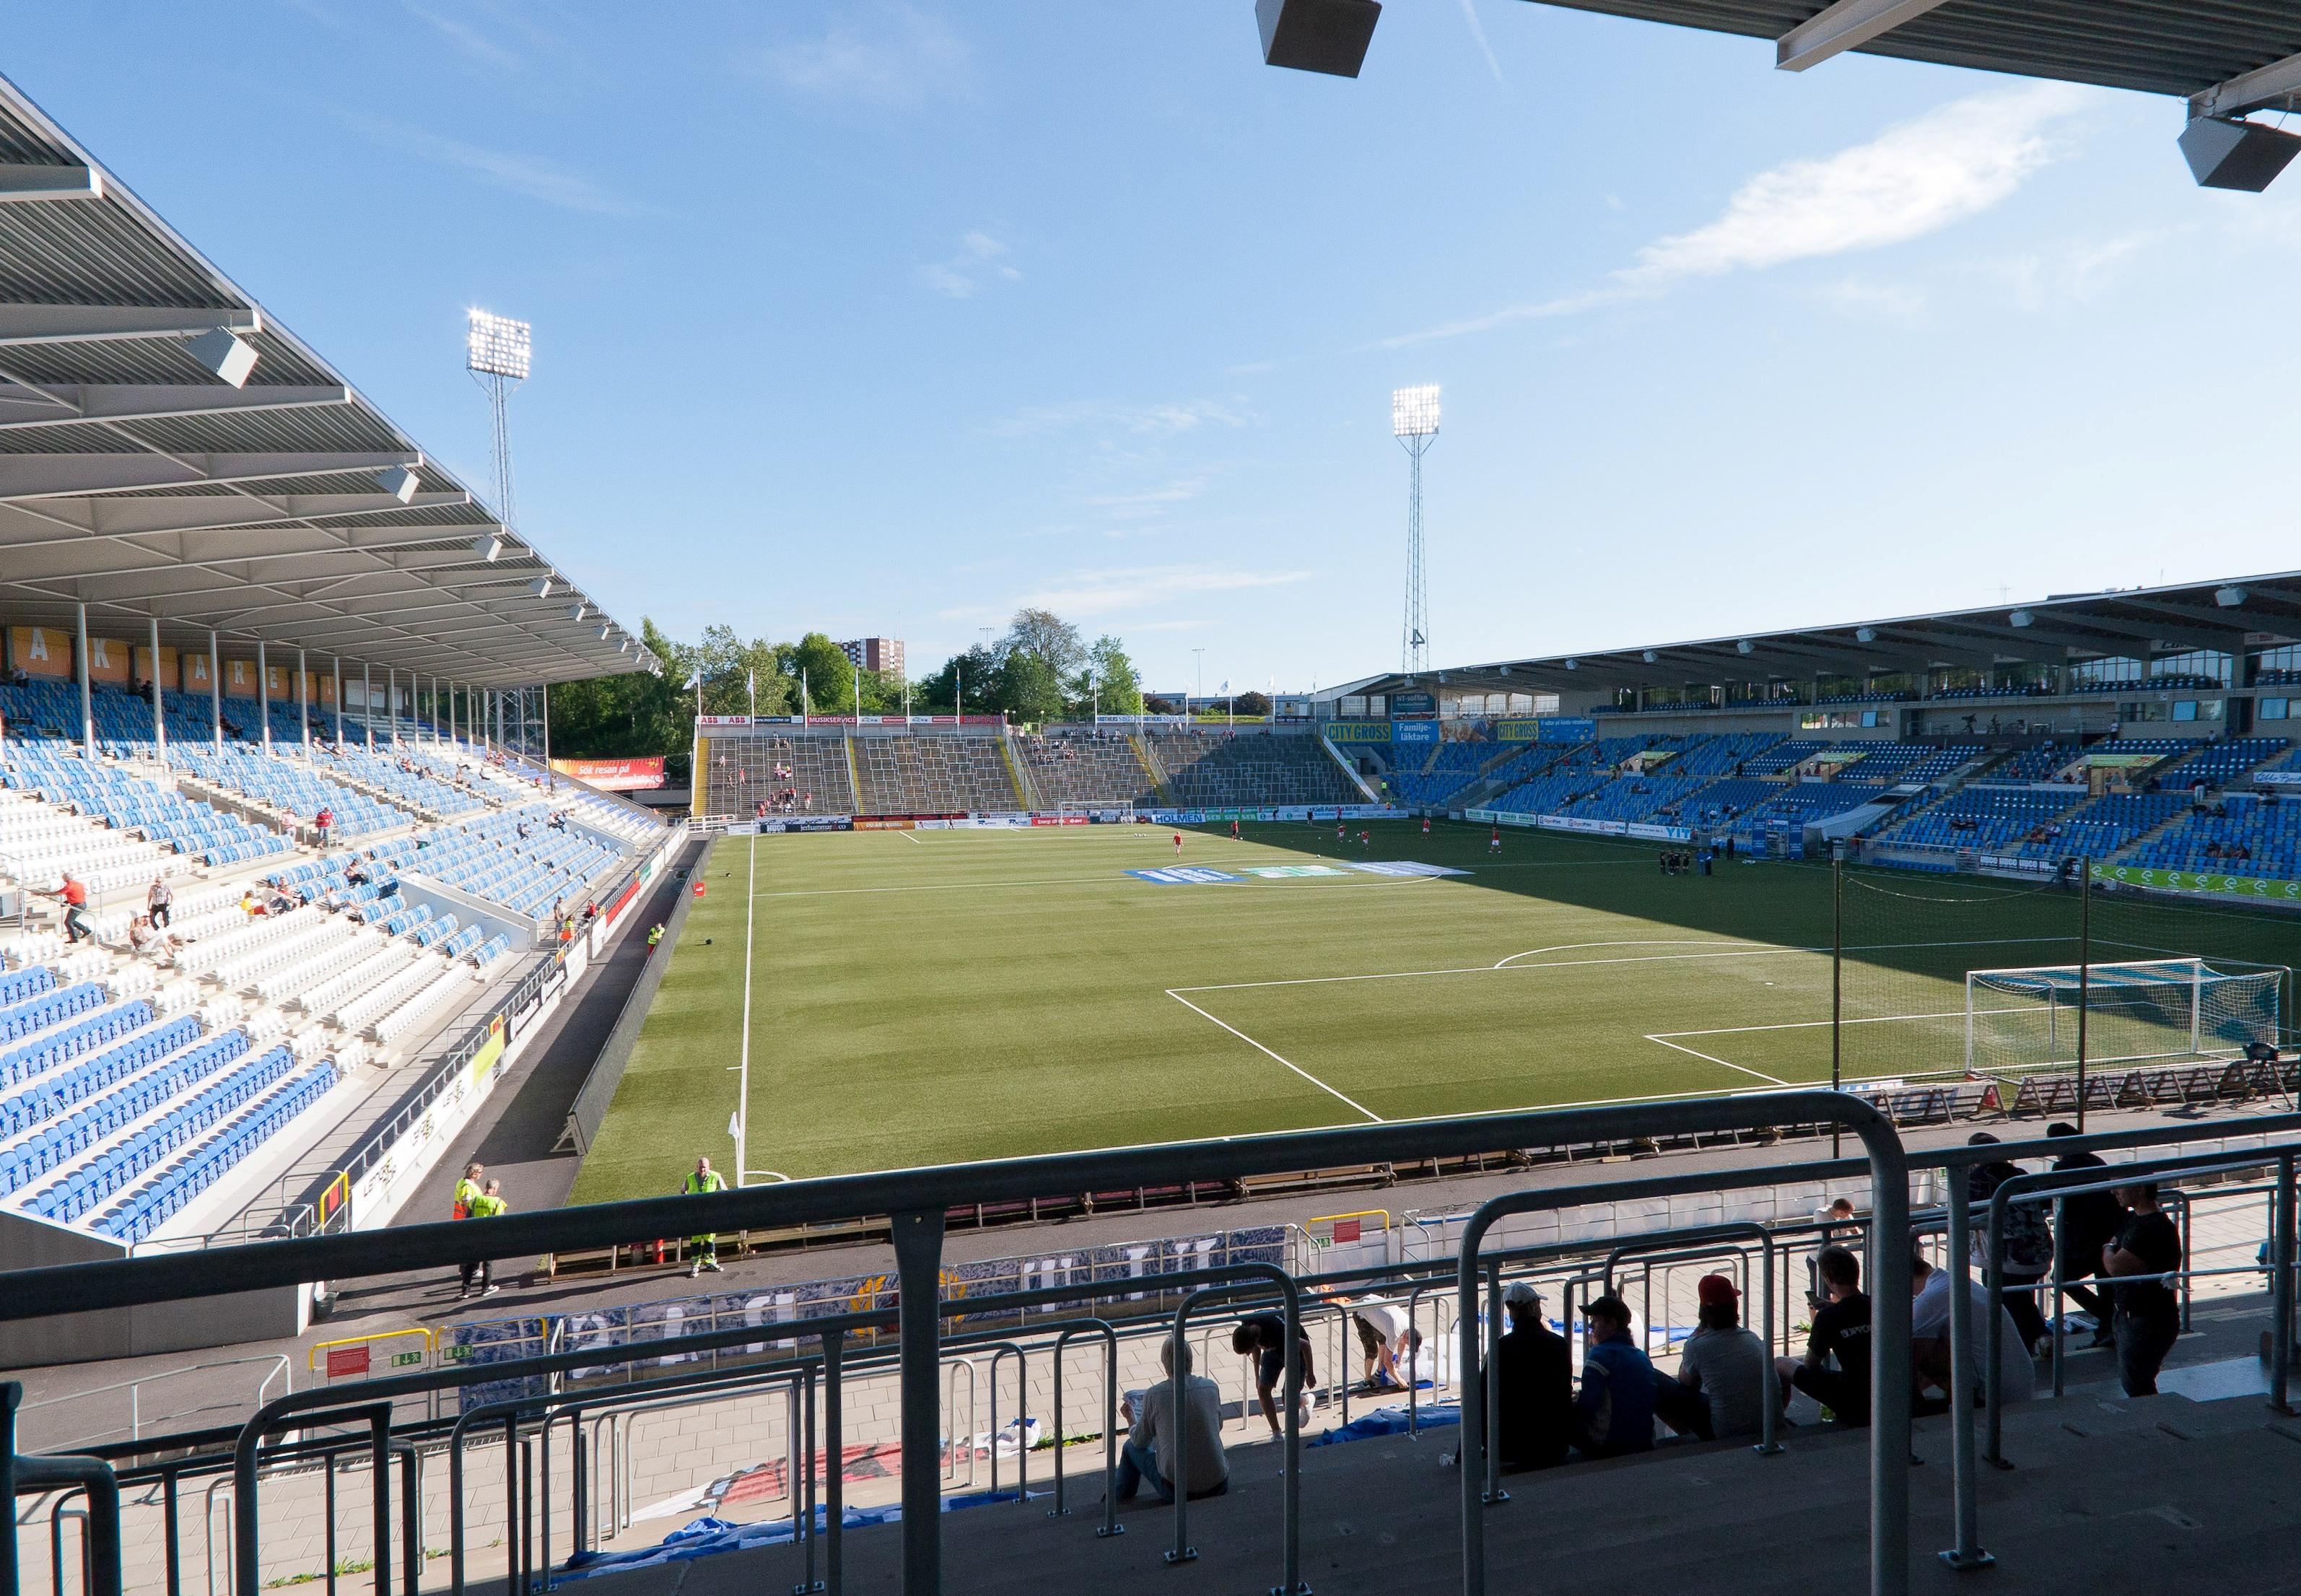 olympia linköping